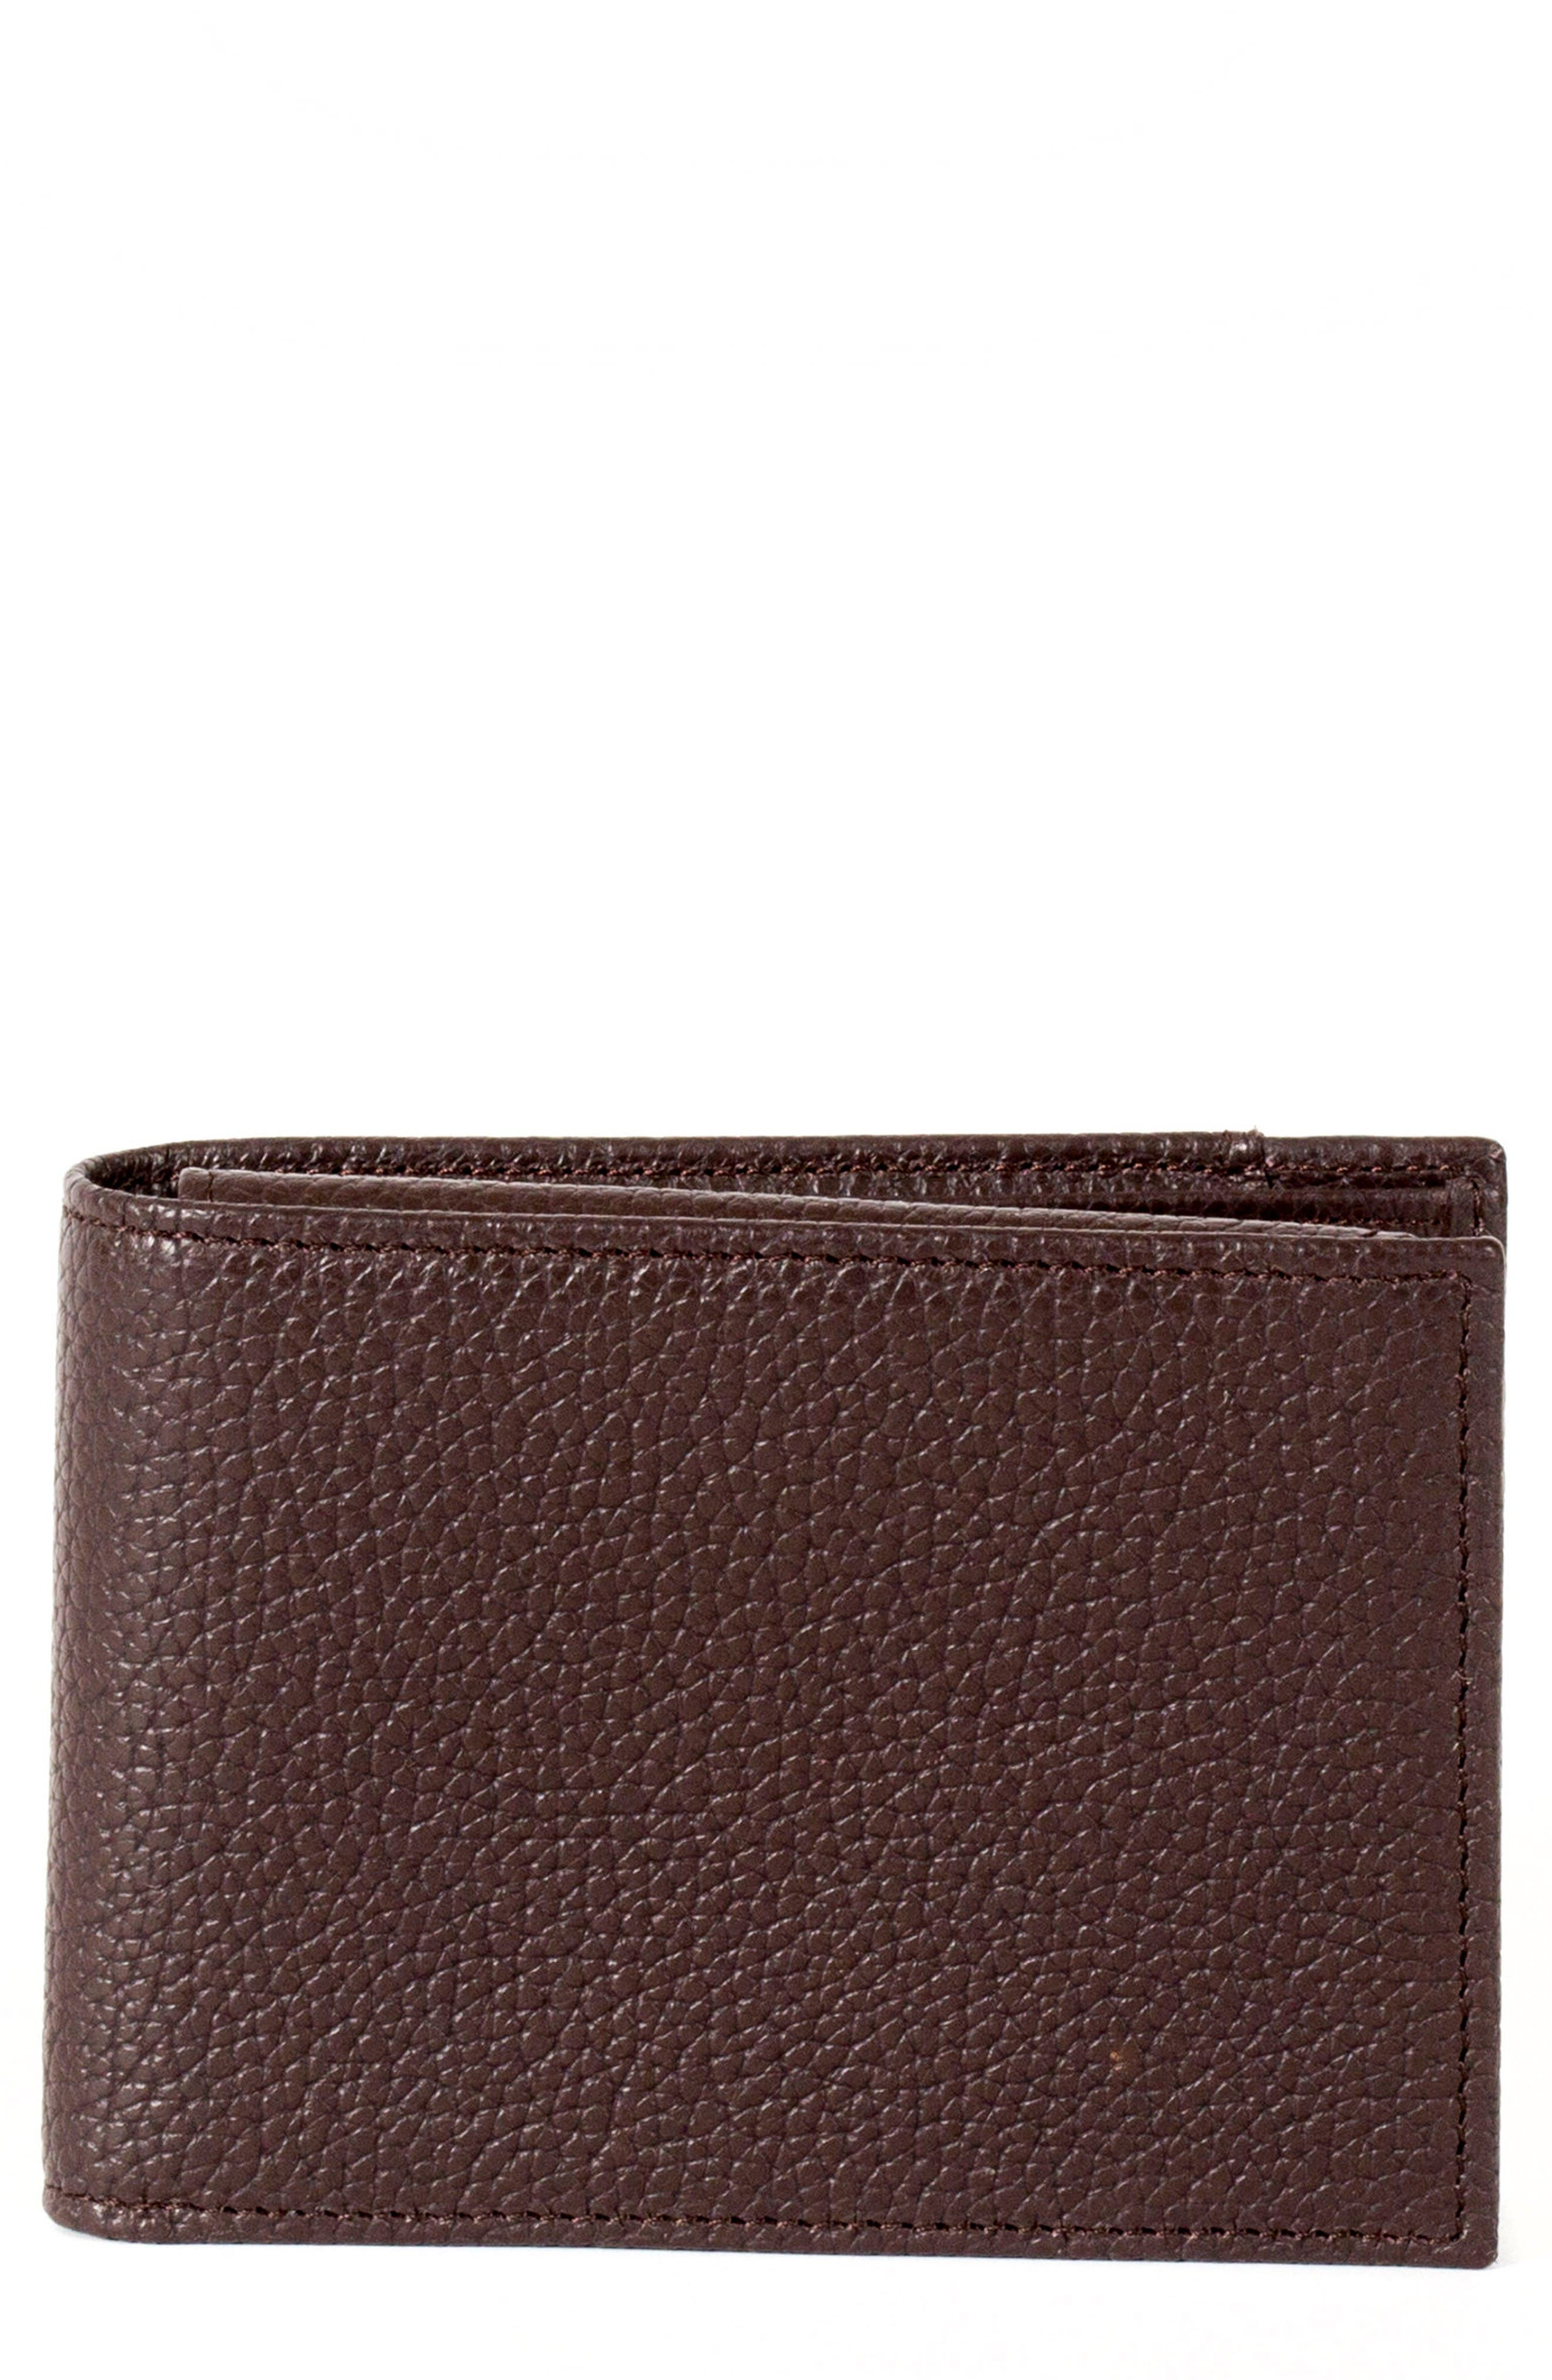 Boconi Garth Leather Wallet